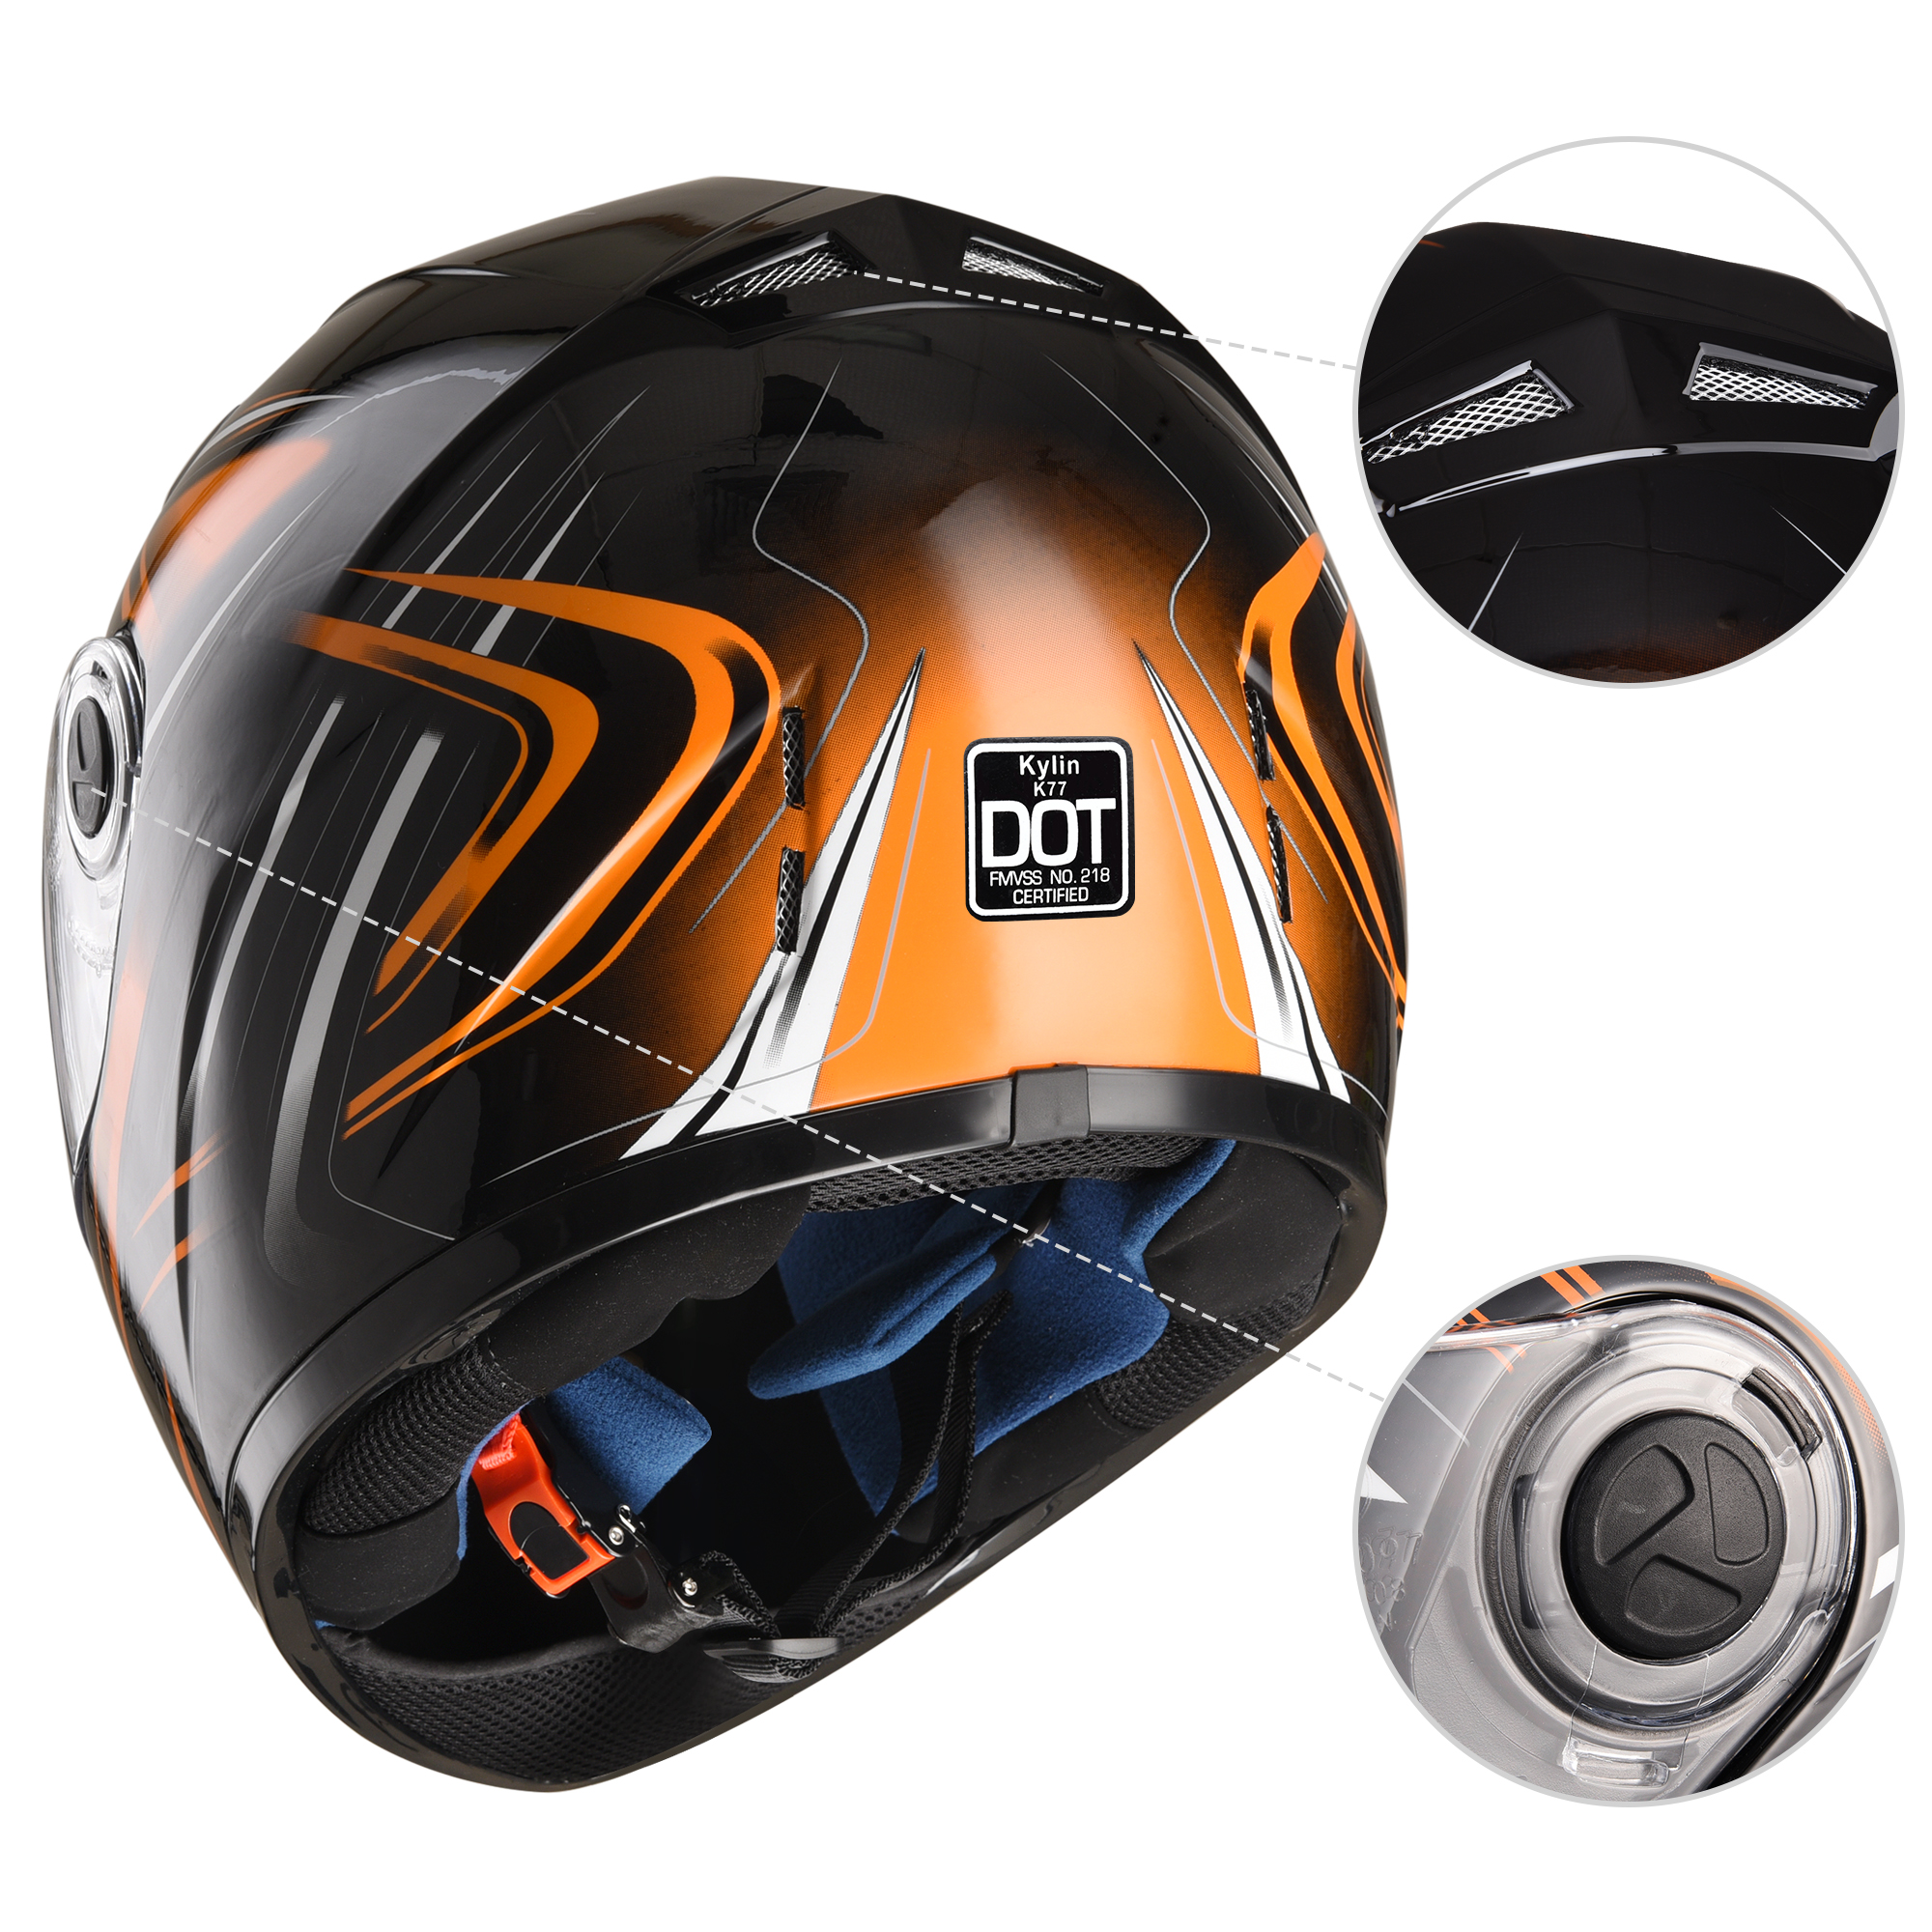 miniature 40 - AHR K12 Full Face Motorcycle Helmet DOT Air Vents Clear Visor Racing S M L XL